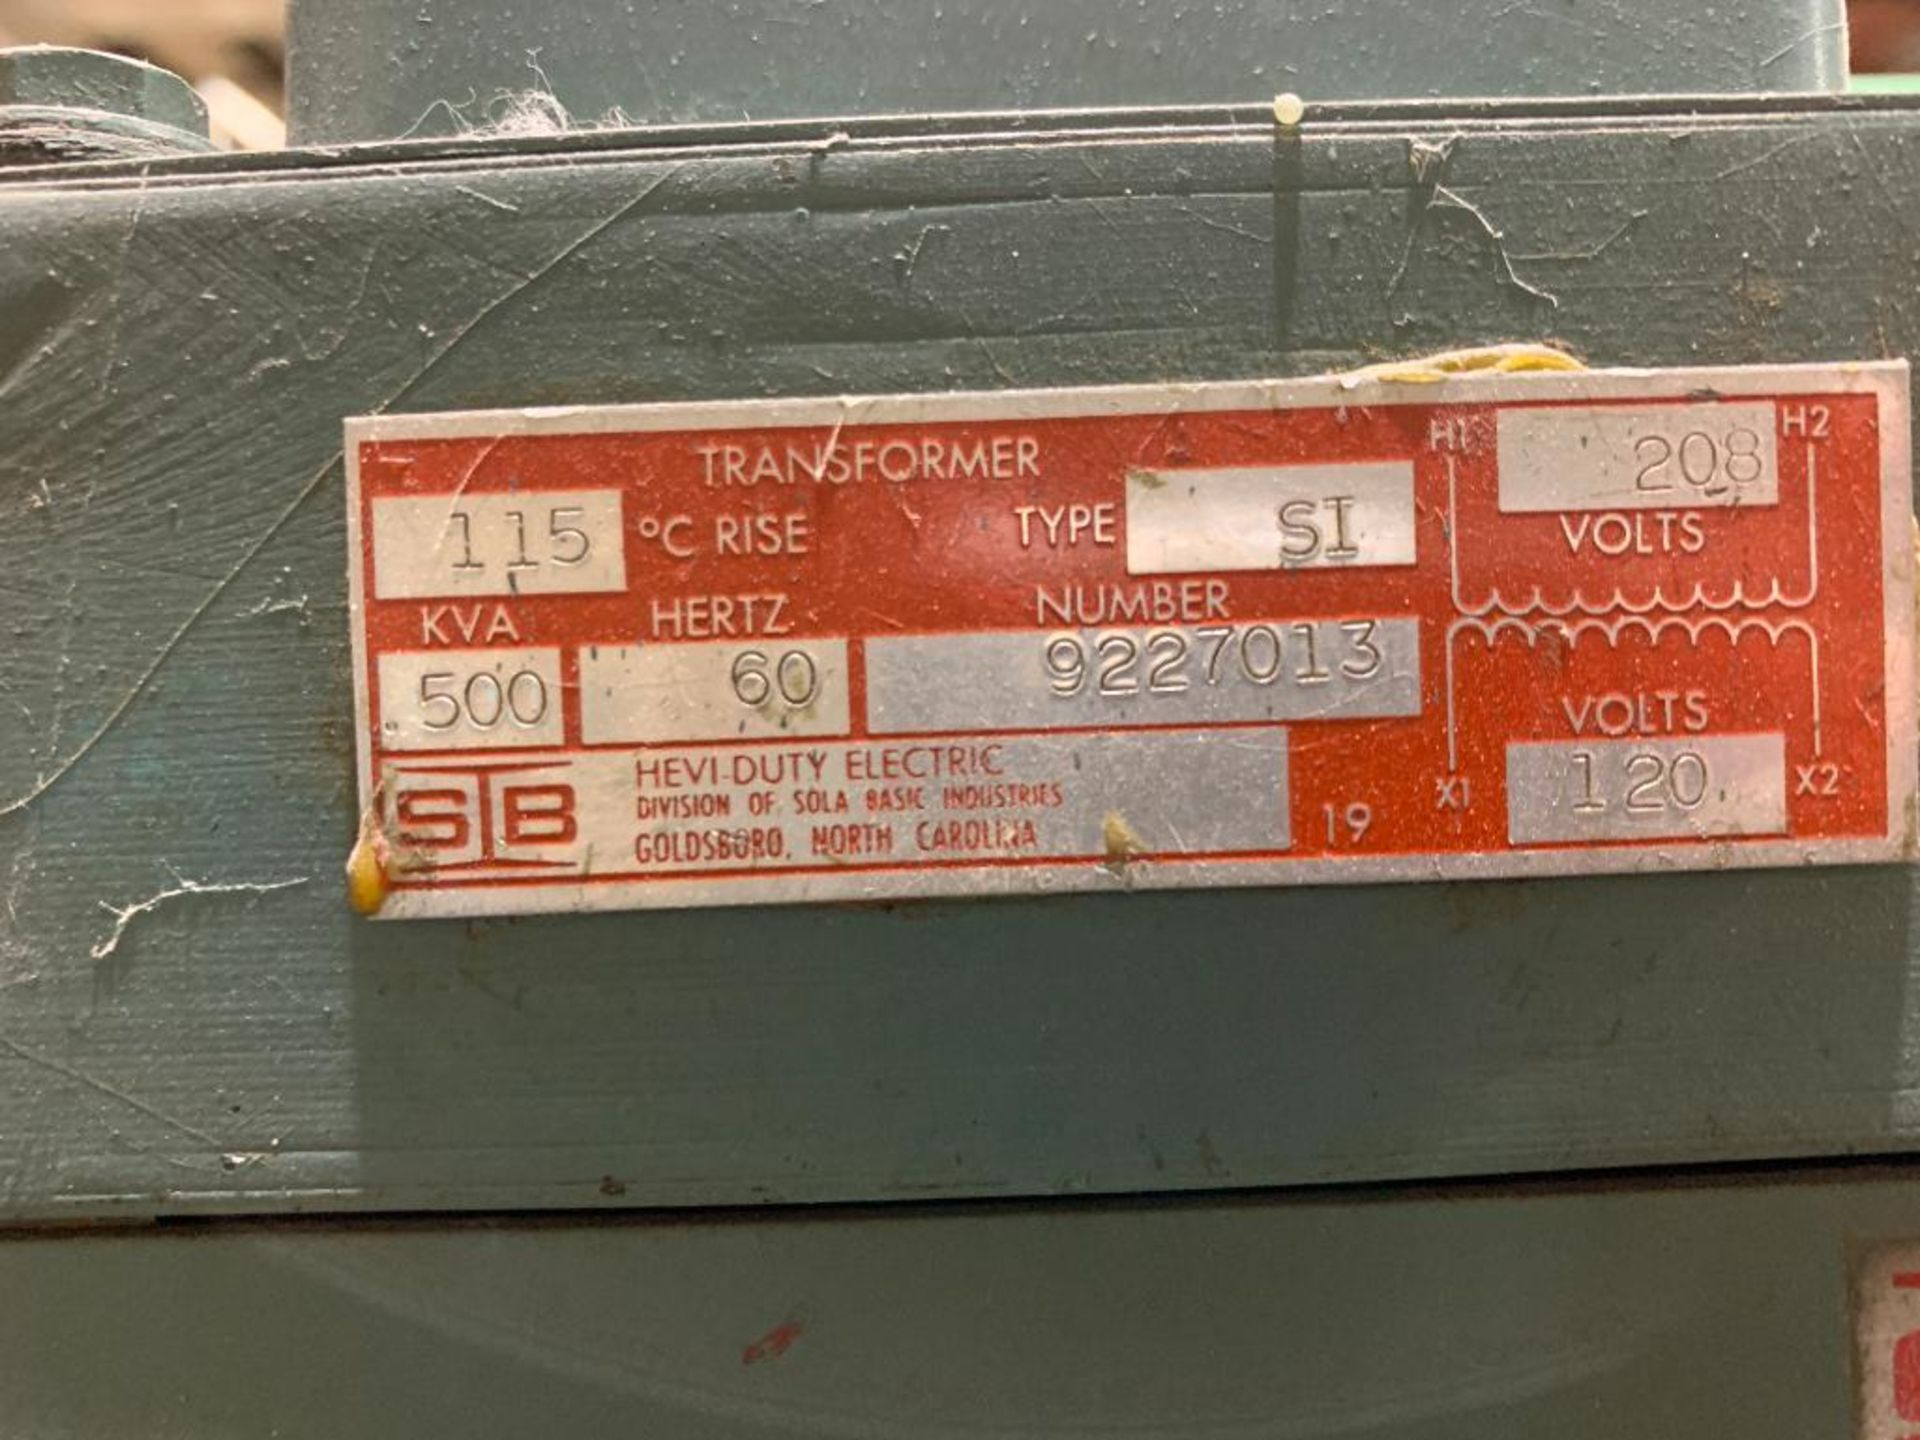 1978 Clybourn carton erecting filling closing machine - Image 3 of 68